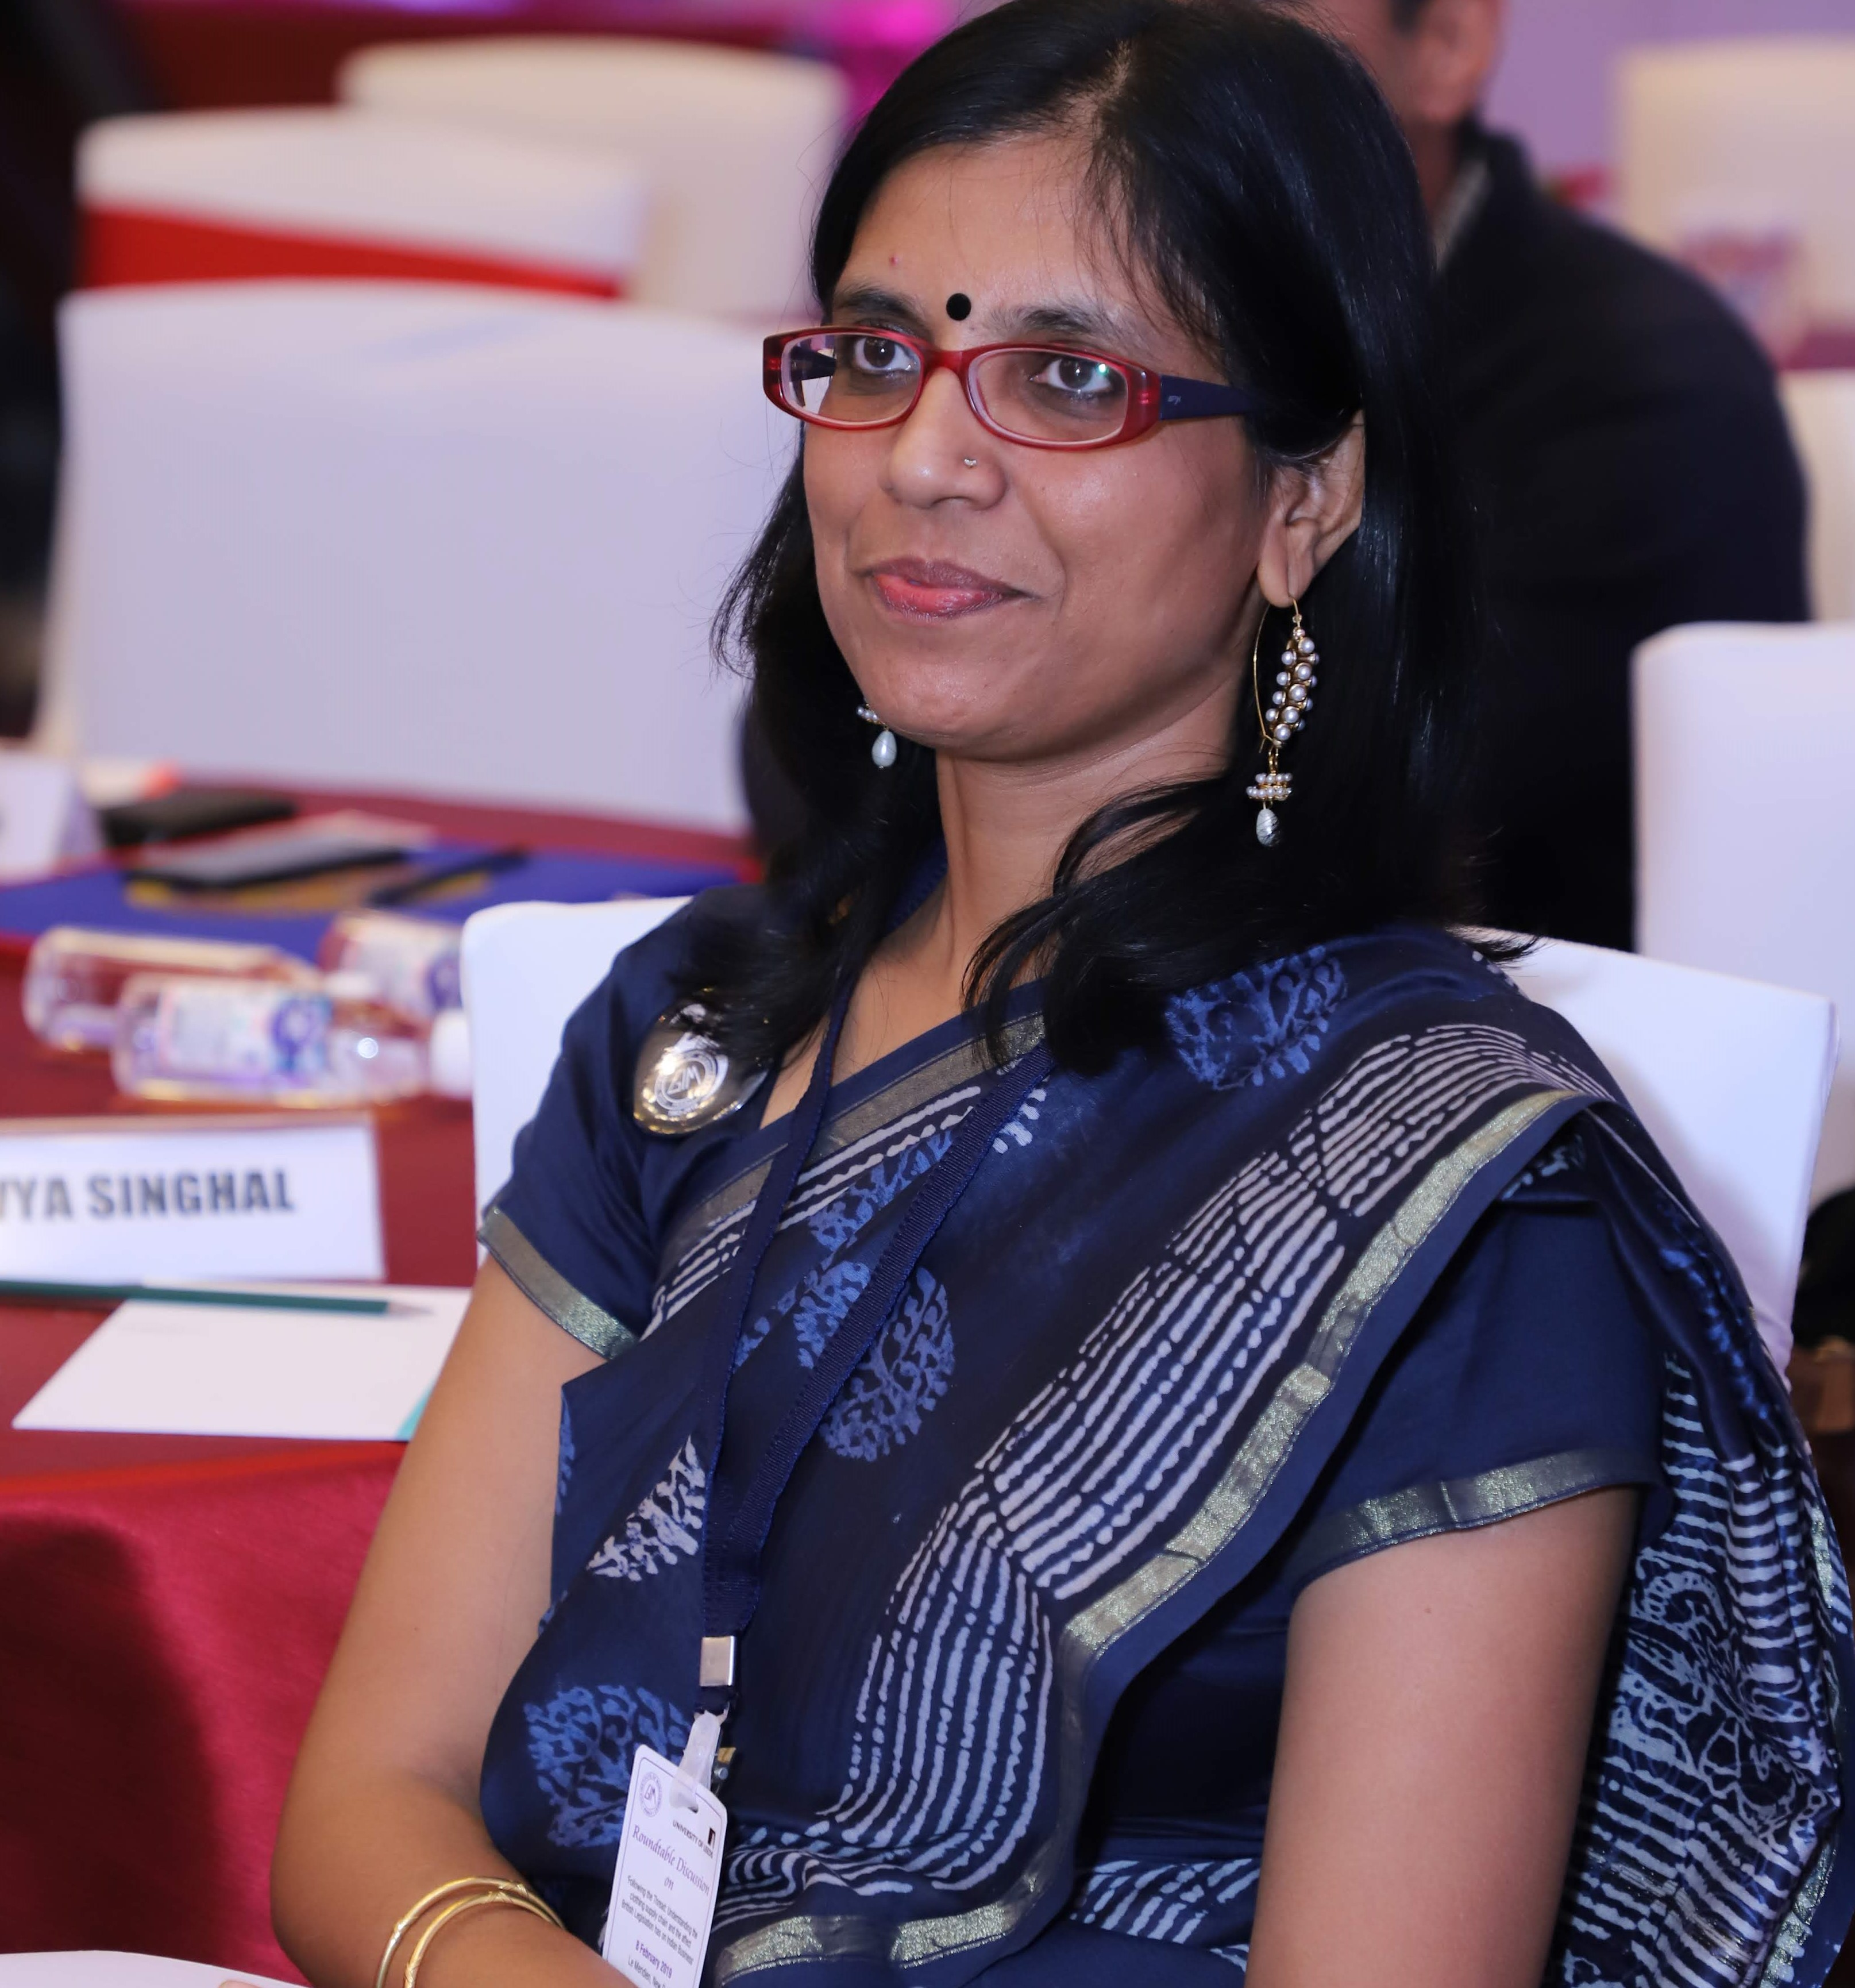 Divya Singhal